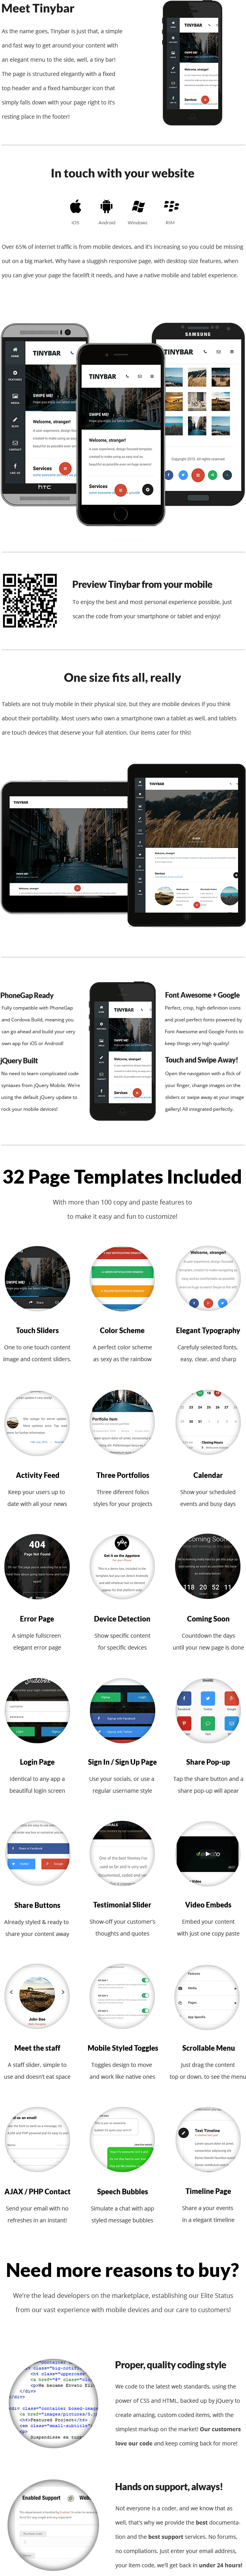 Tinybar | Mobile & Tablet Responsive Template